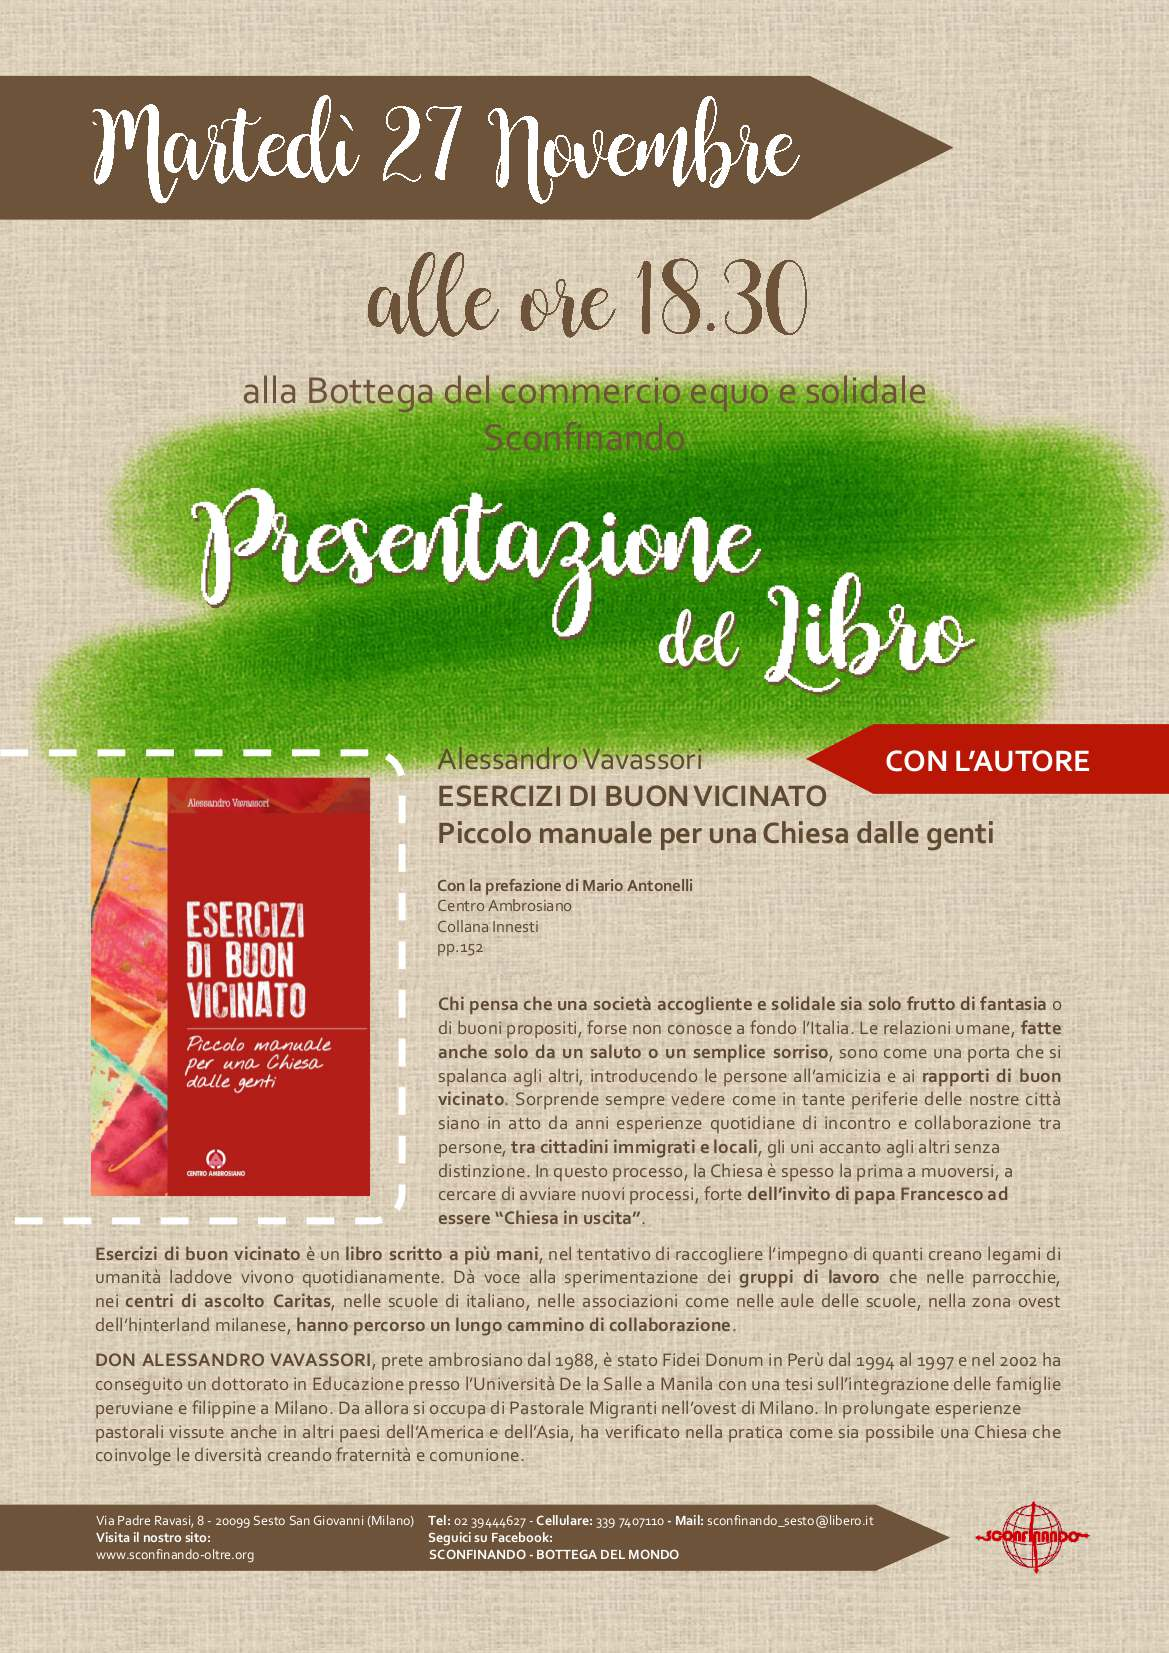 LibroDonAlessandroVavassori